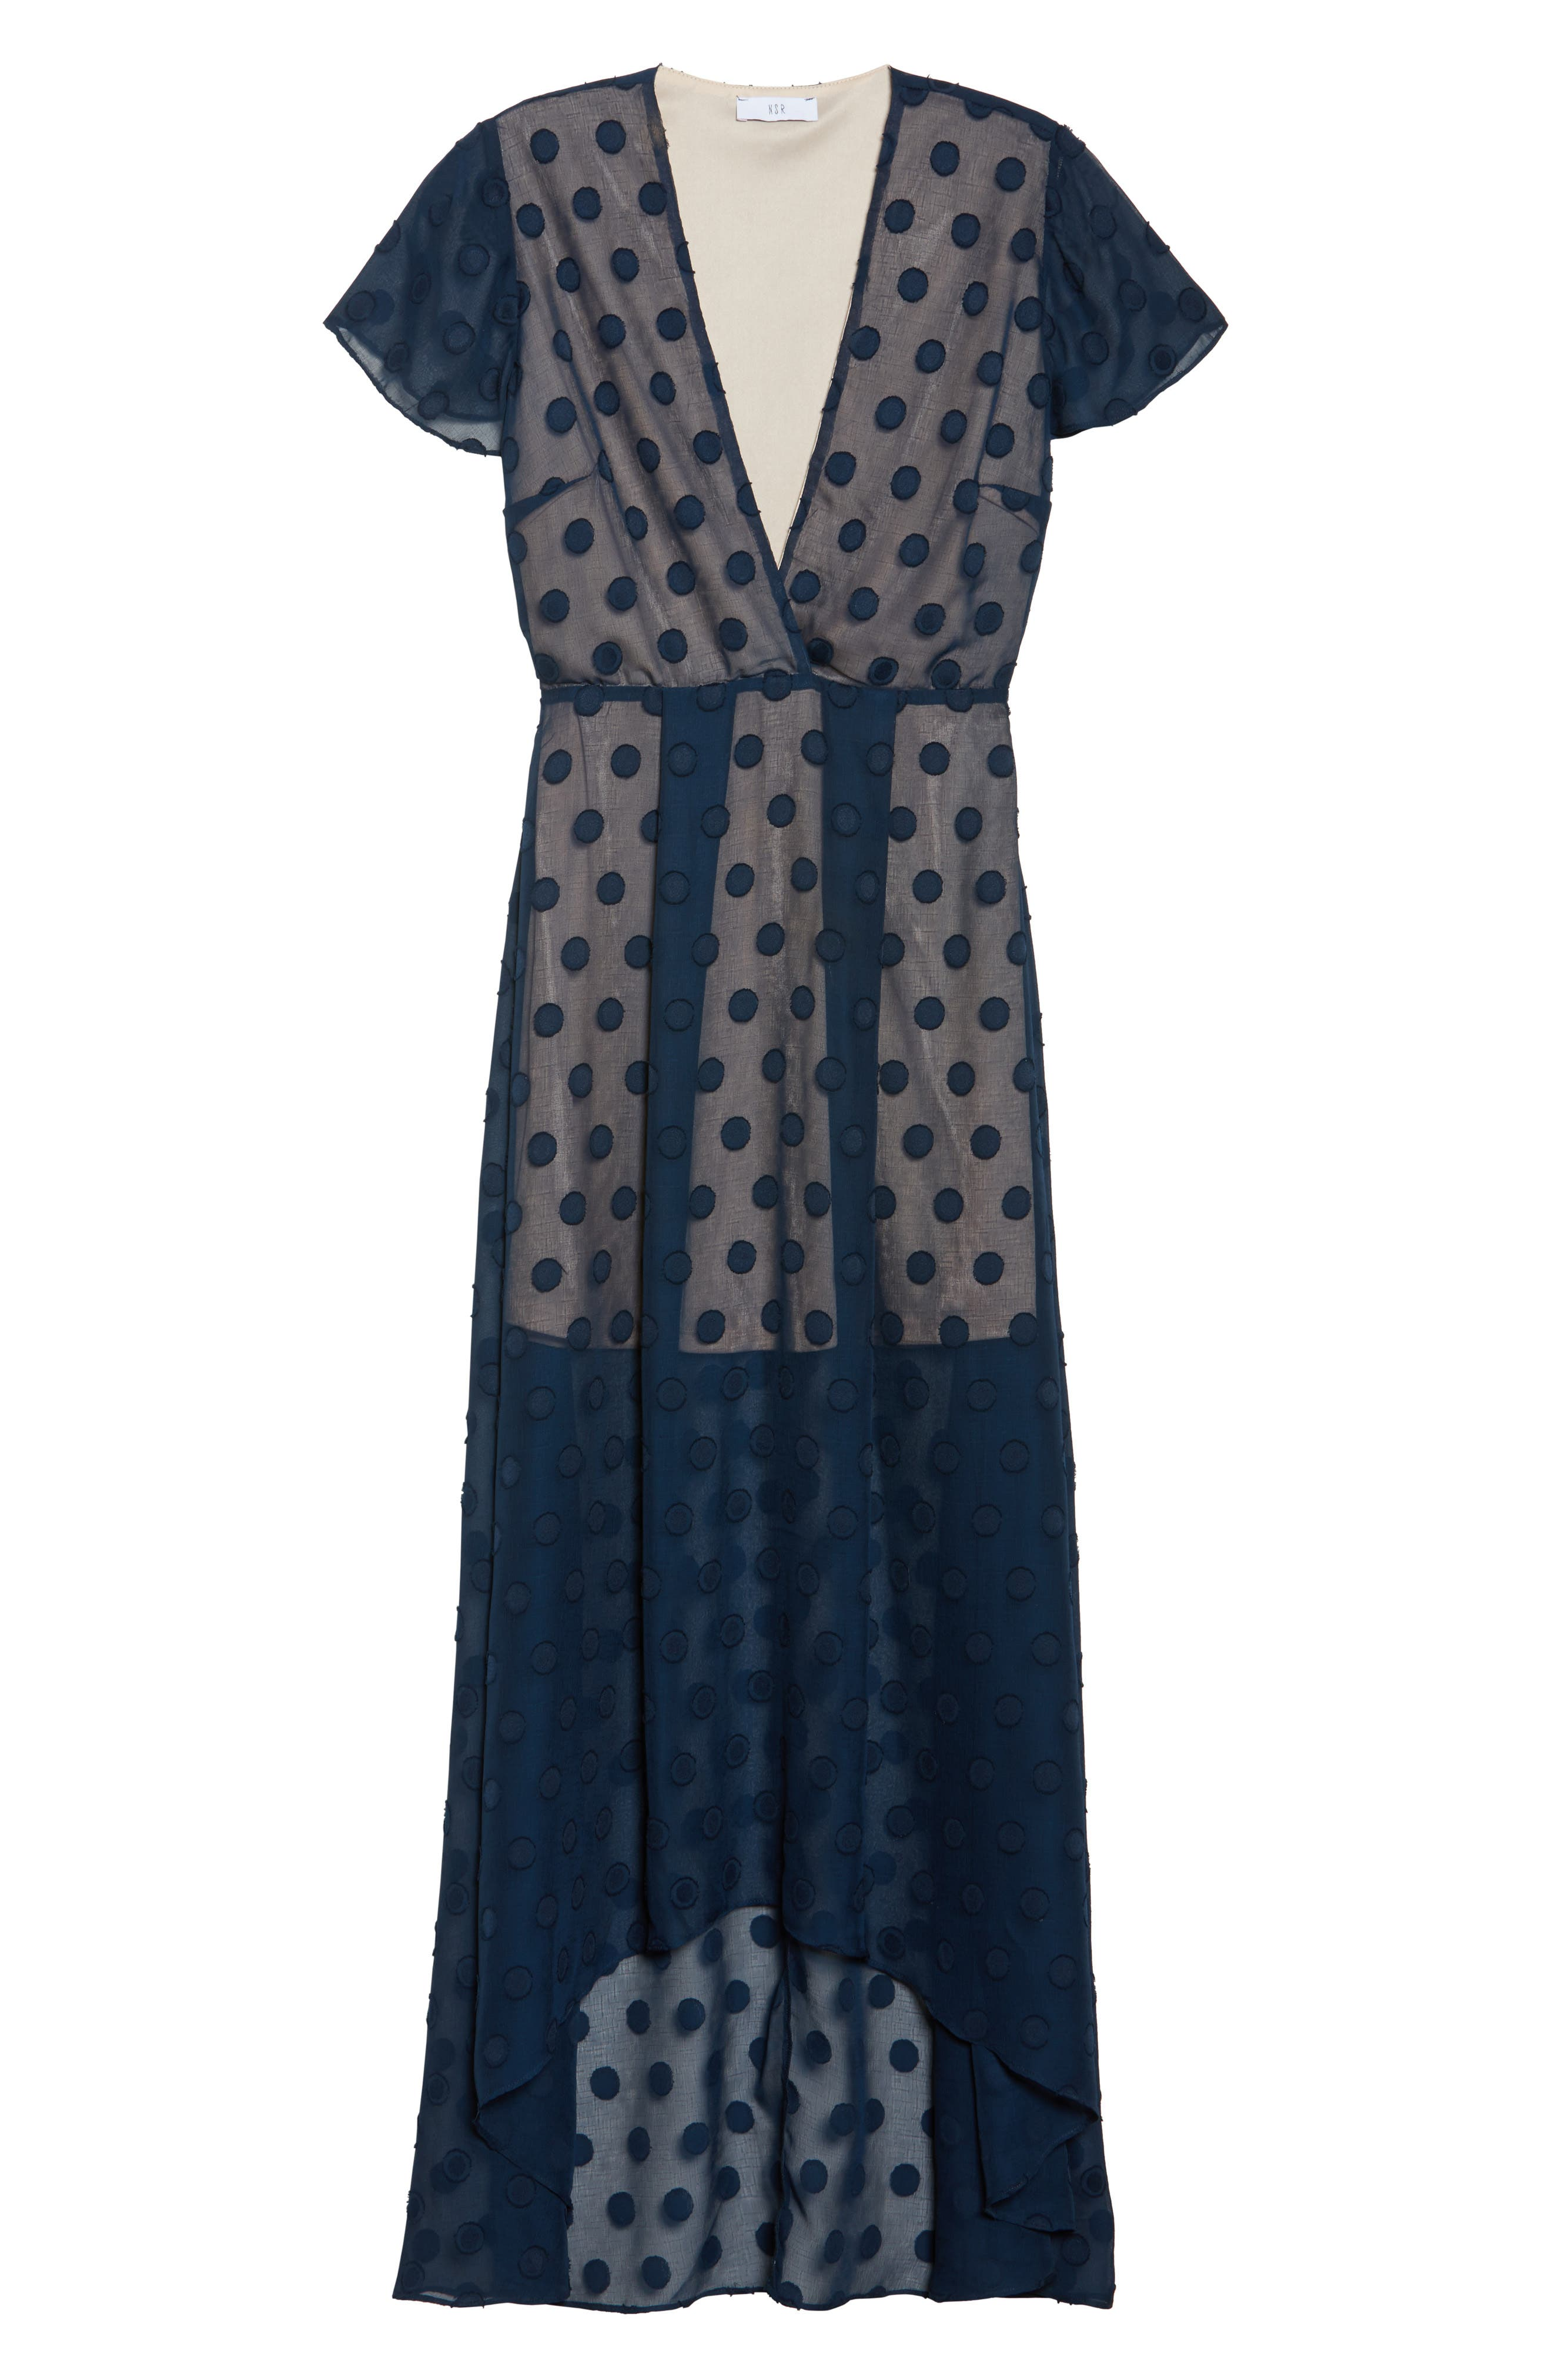 Alexis Dot Jacquard Maxi Dress,                             Alternate thumbnail 6, color,                             Navy